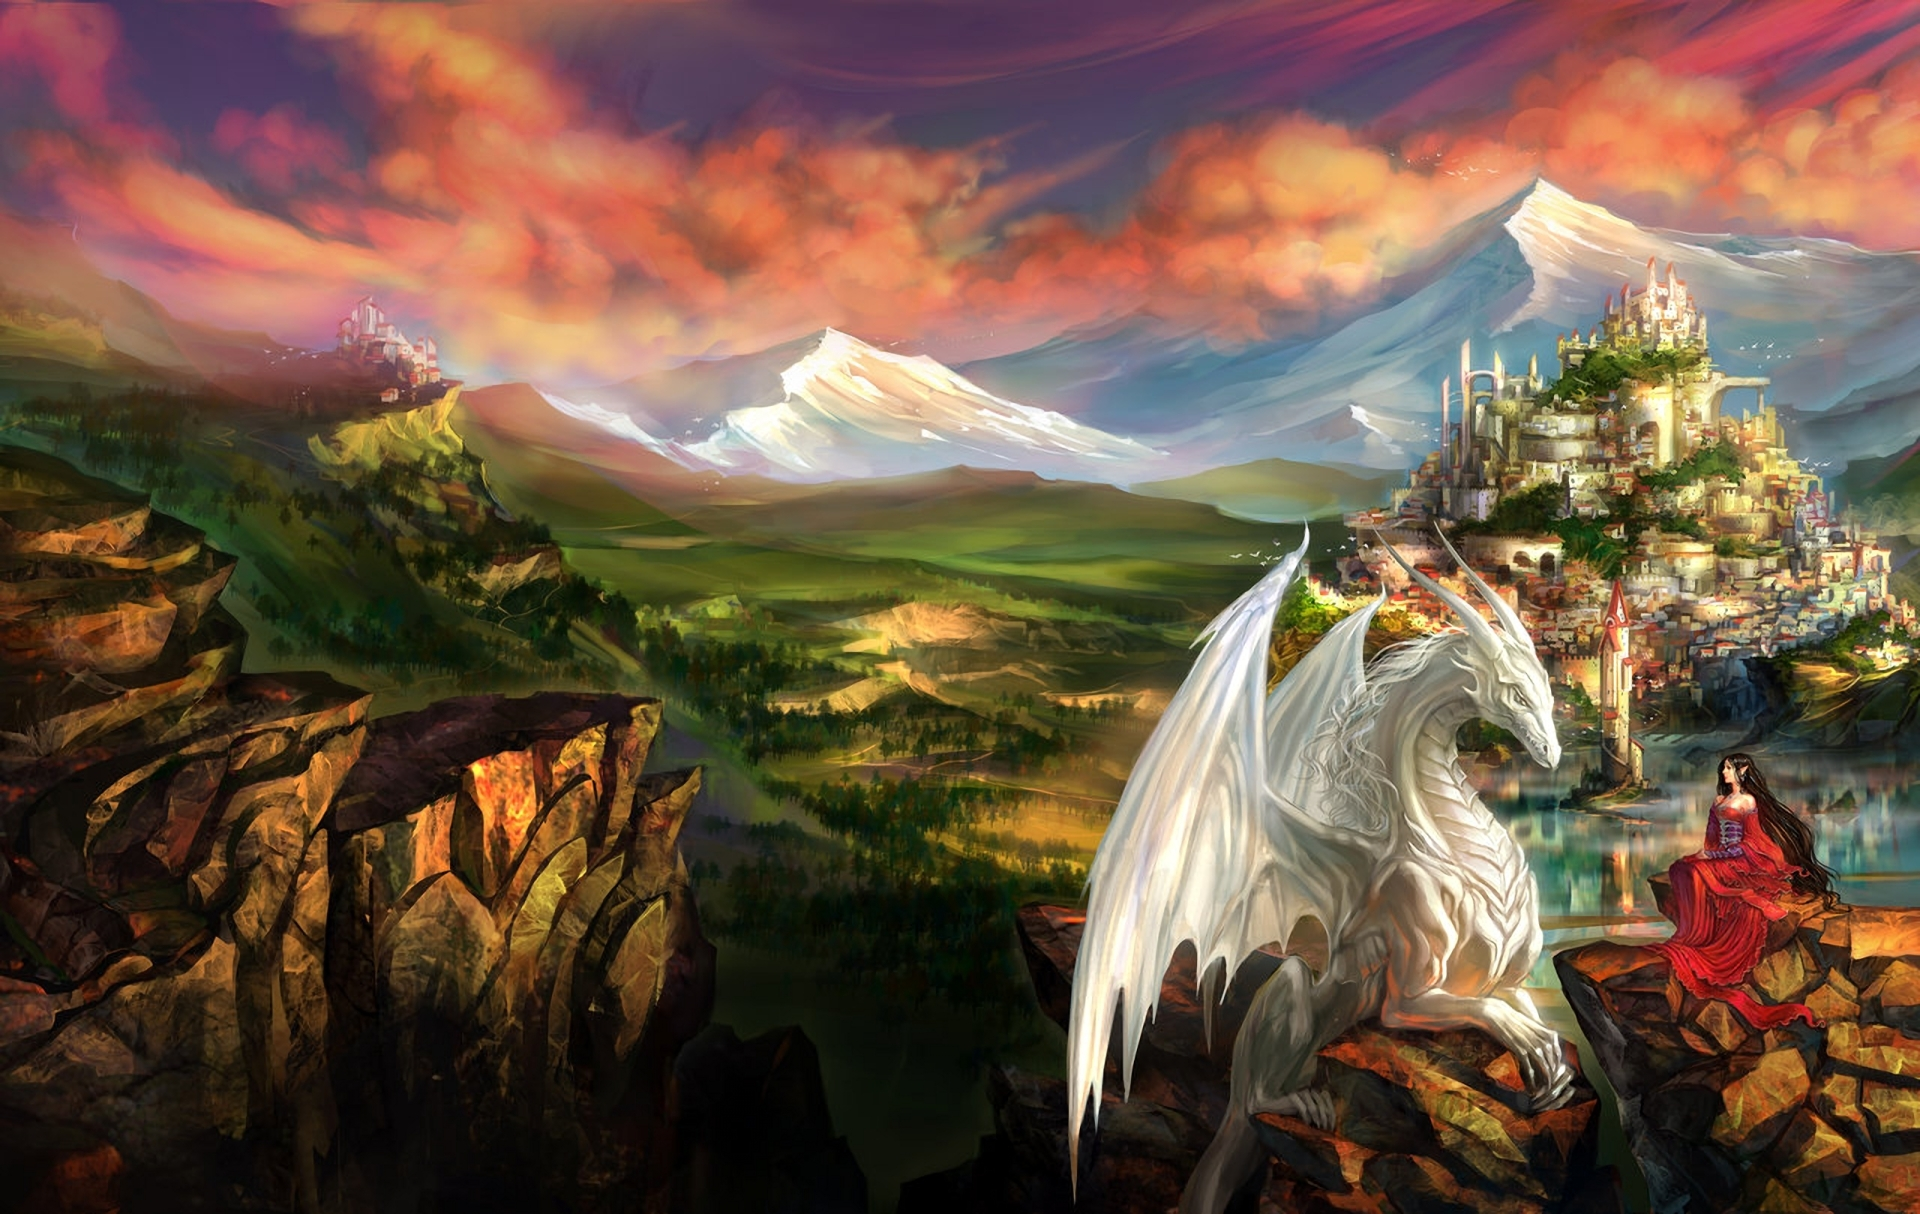 [47+] Dragon City Wallpapers on WallpaperSafari